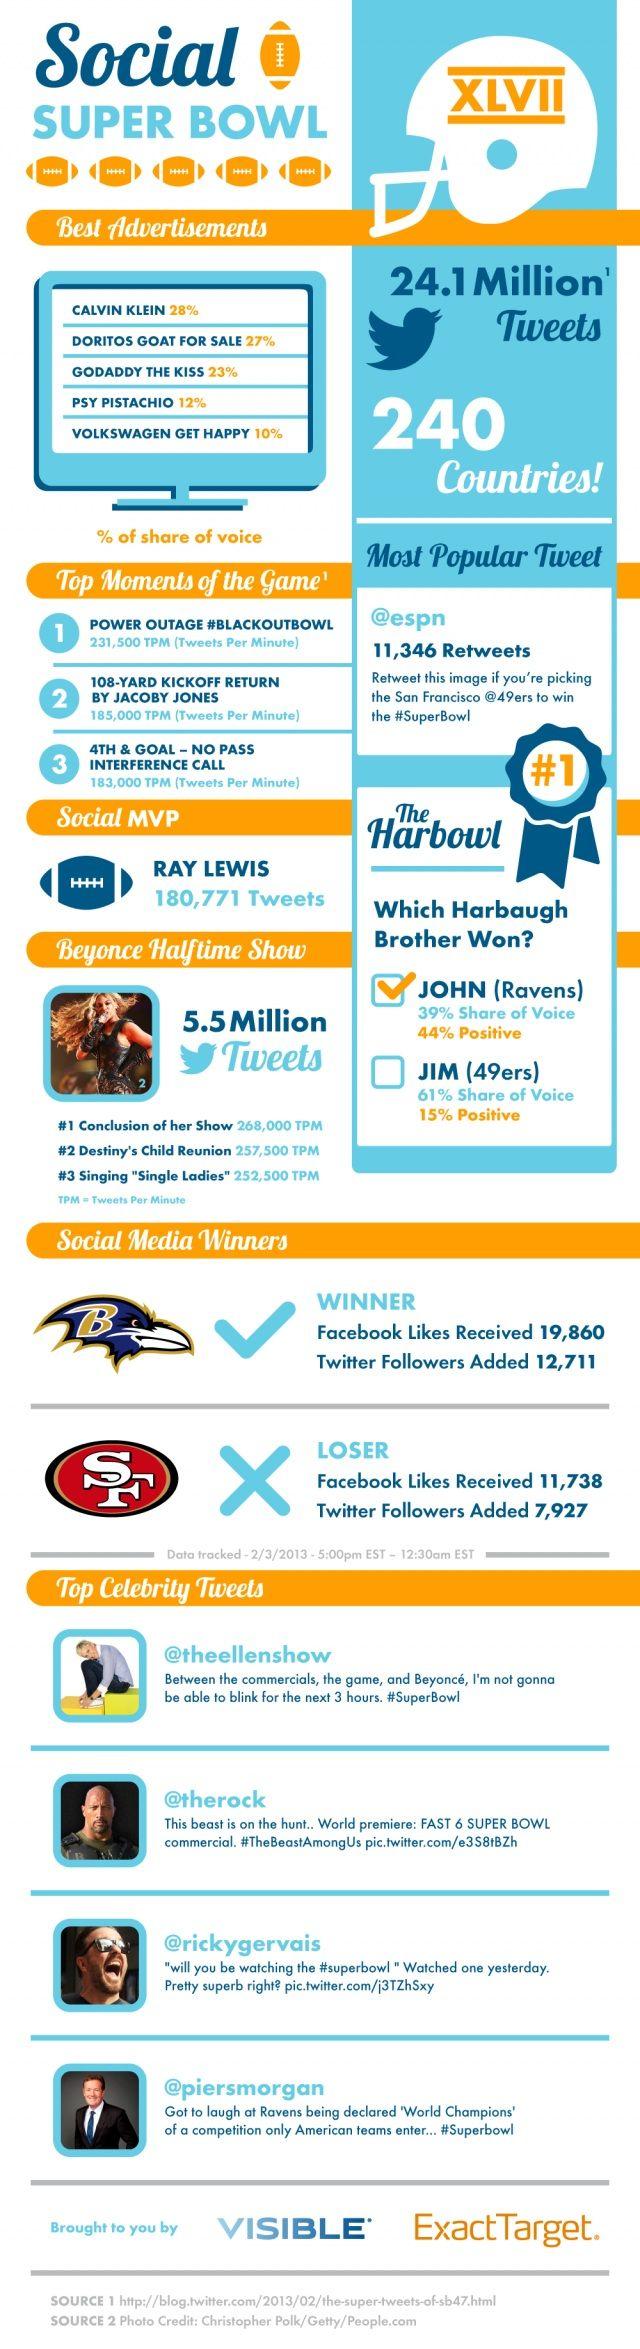 Social Media - The Social Super Bowl XLVII [Infographics] : MarketingProfs Article